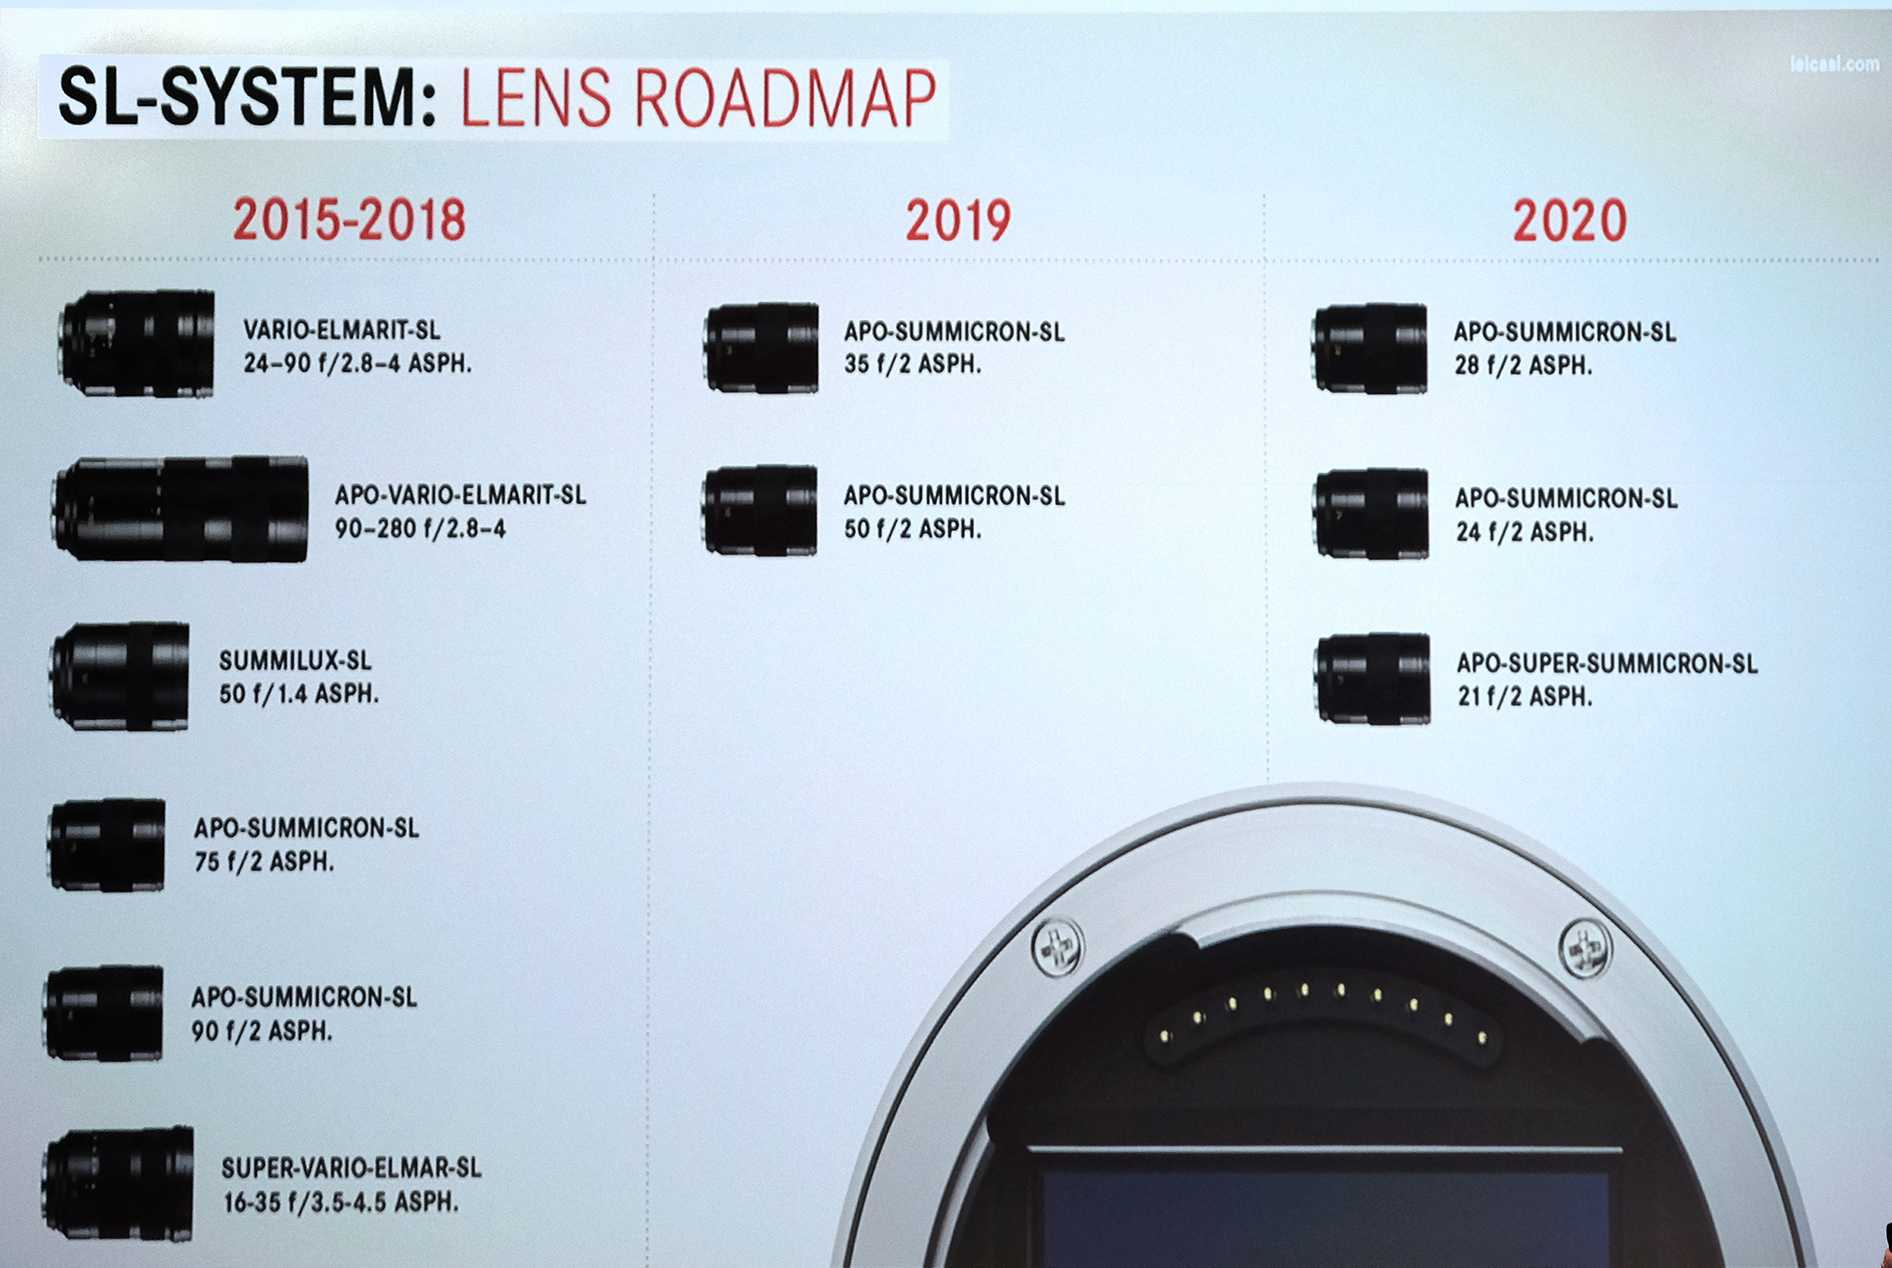 Leica Roadmap